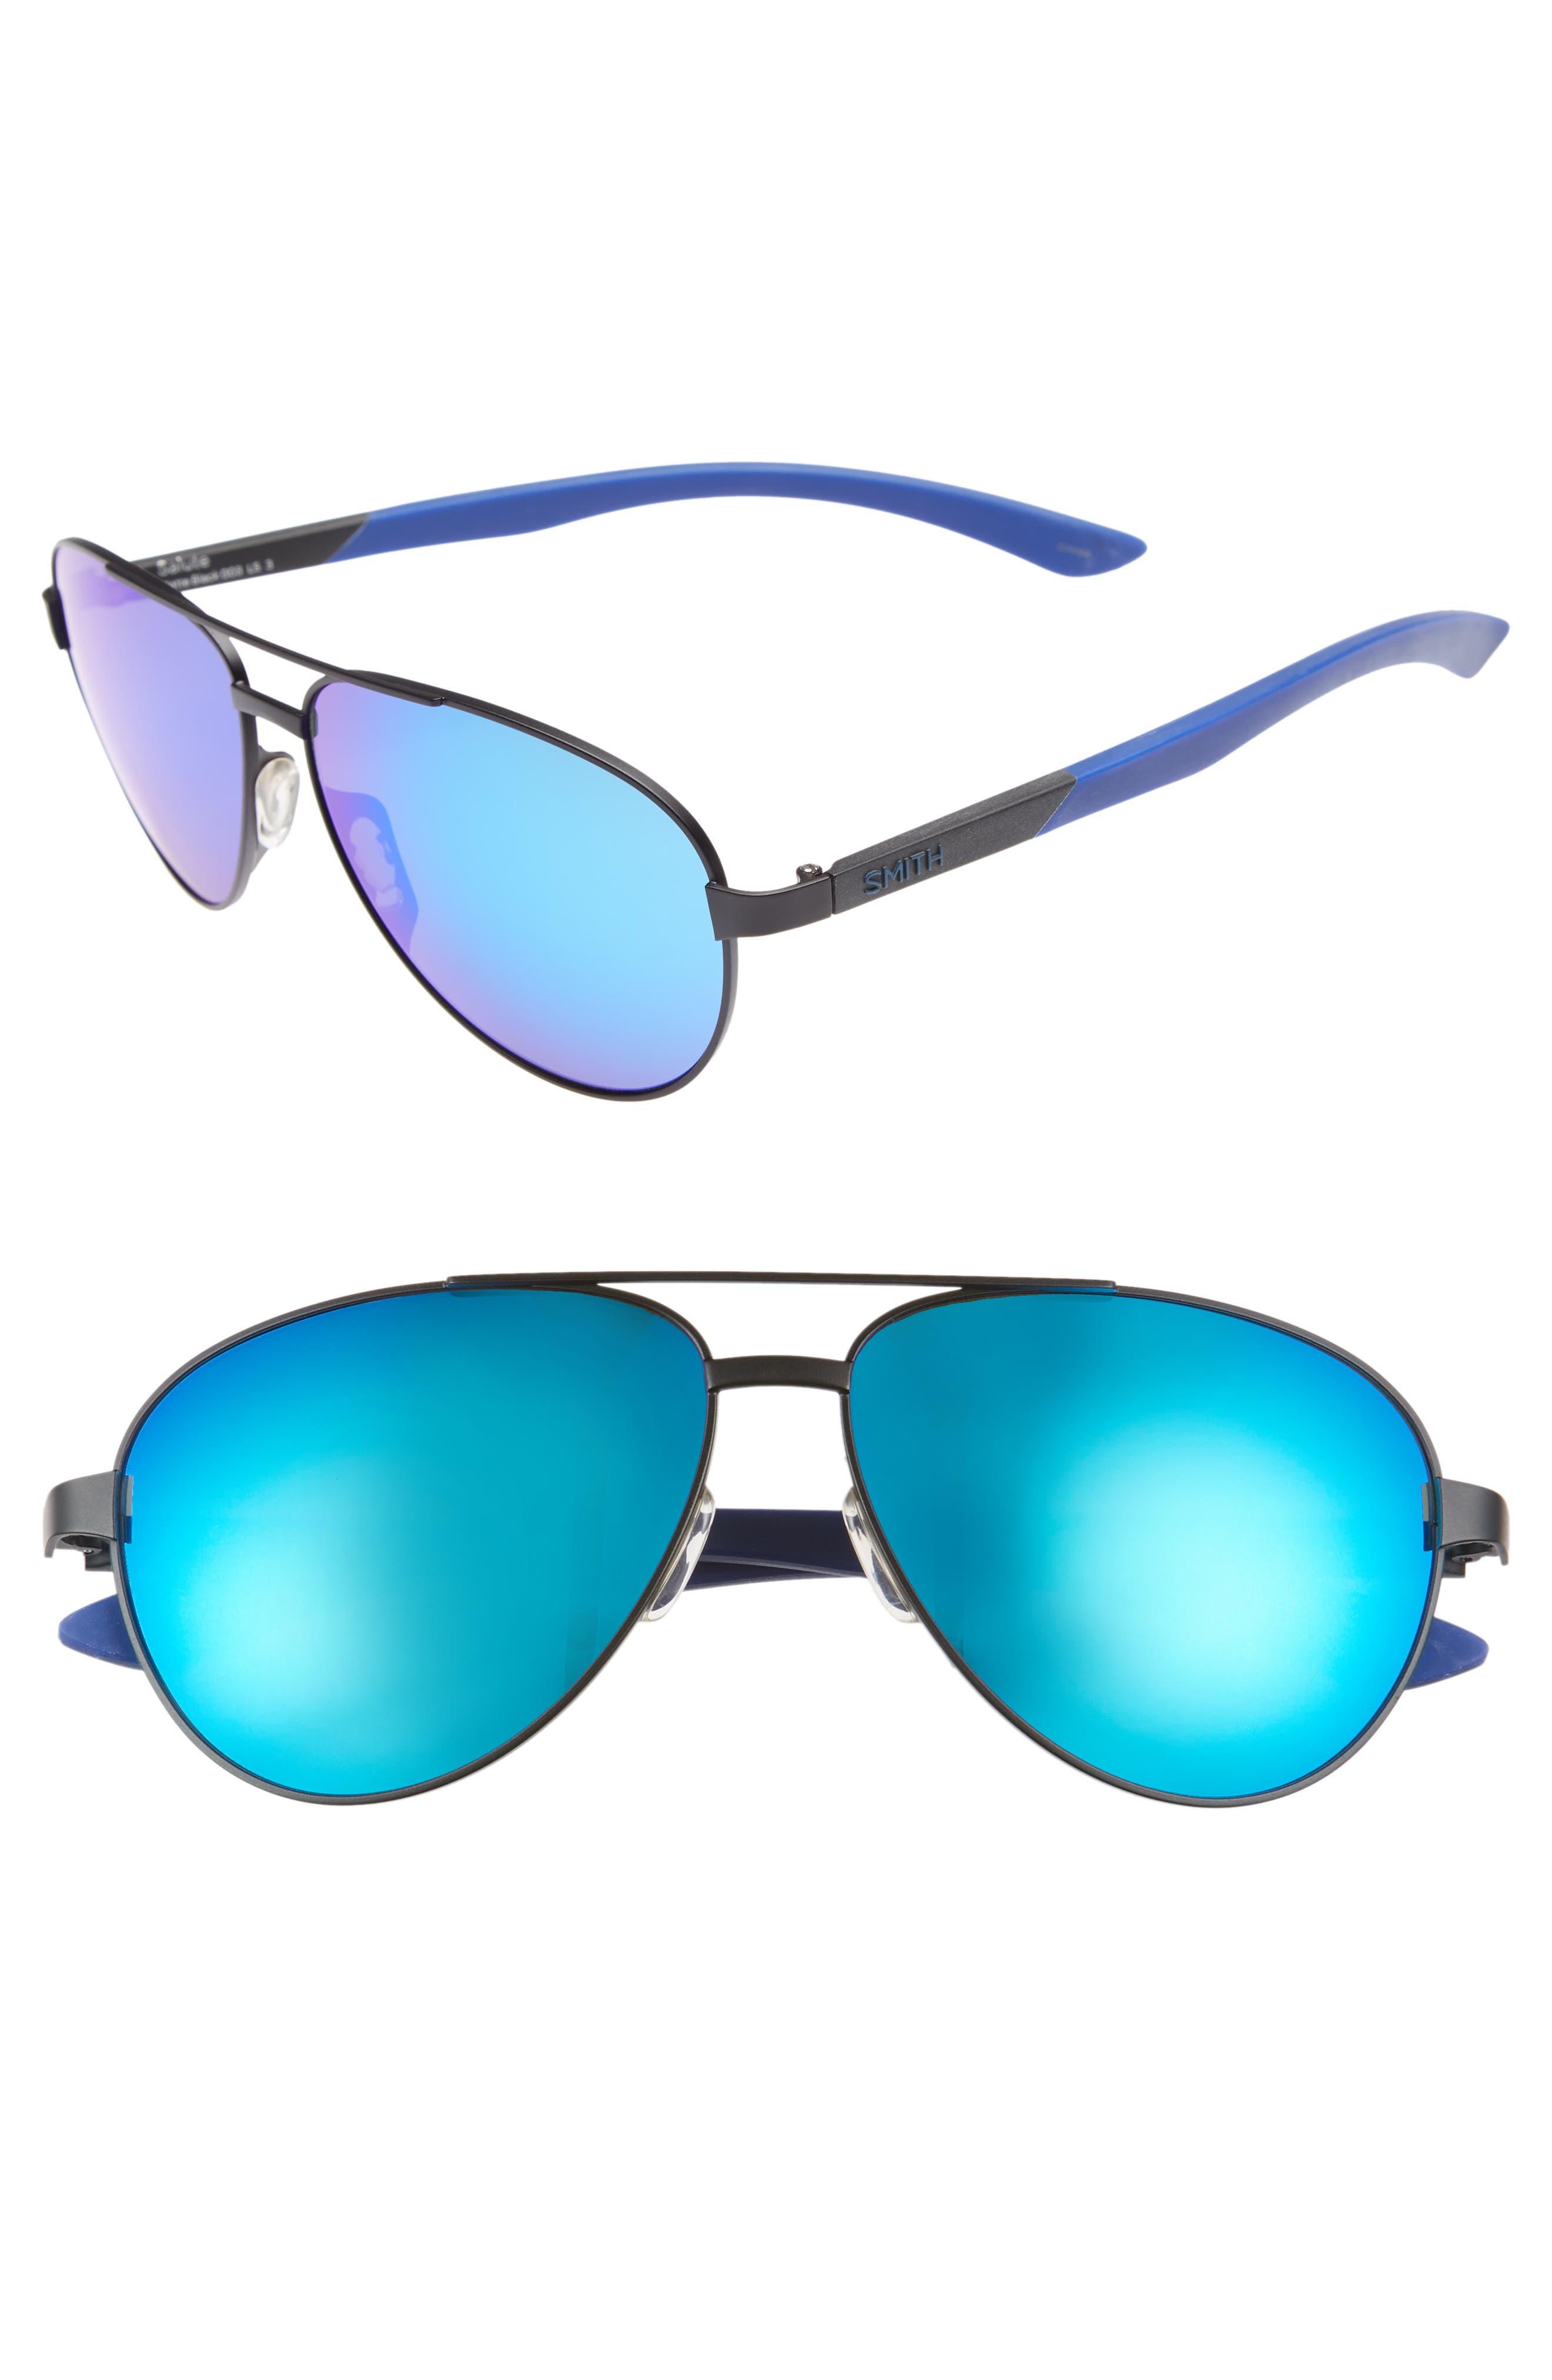 Salute 59mm Aviator Sunglasses,                         Main,                         color, 001